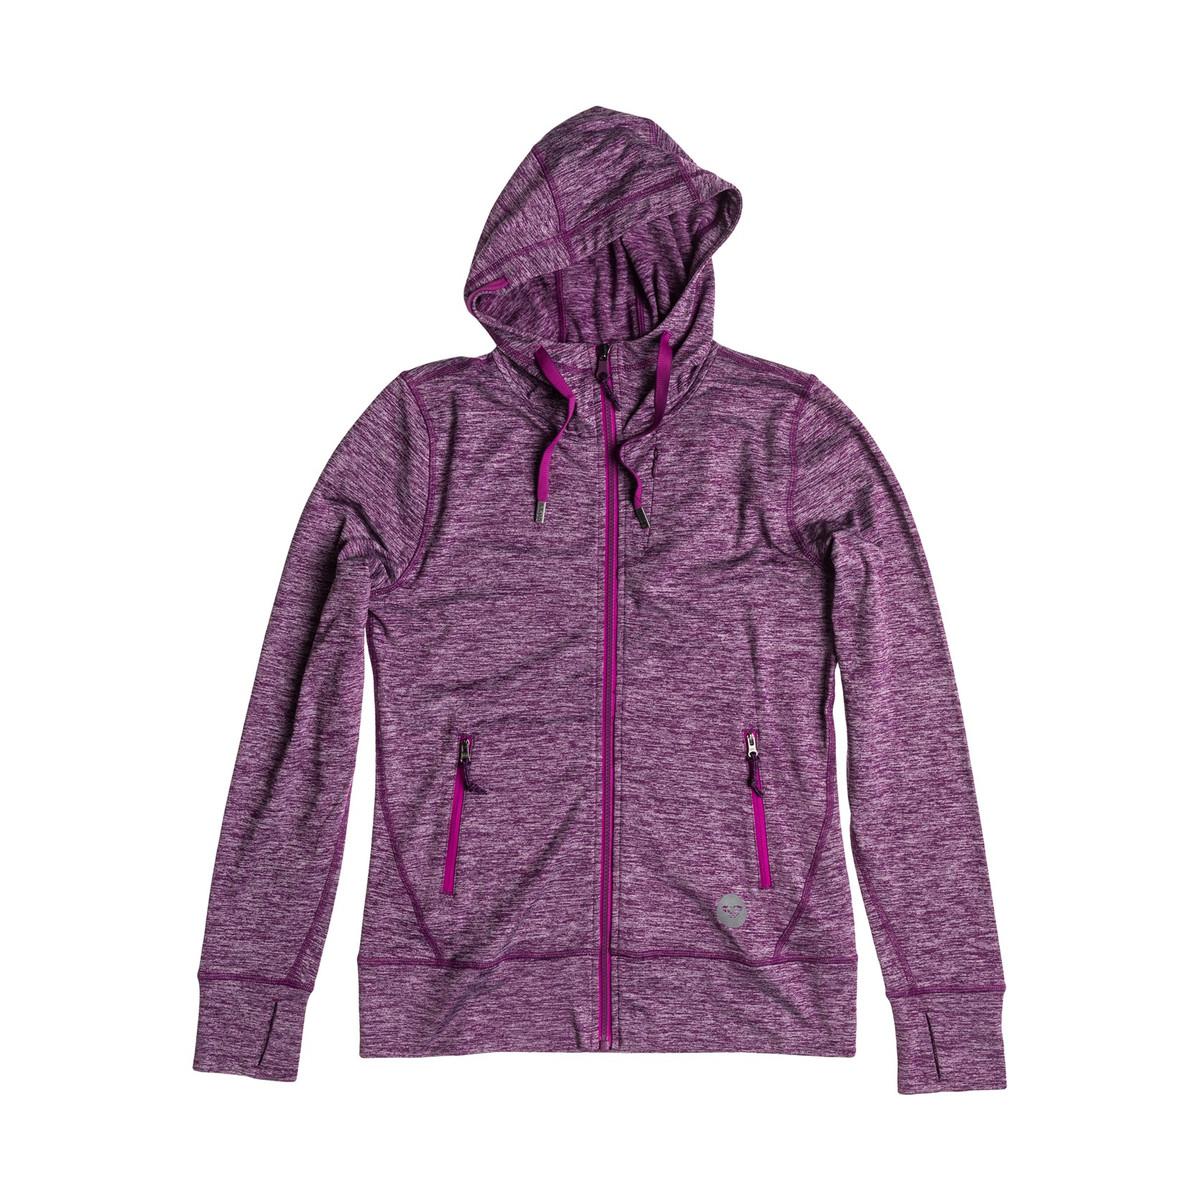 Roxy Vertigo Full-Zip Hoodie